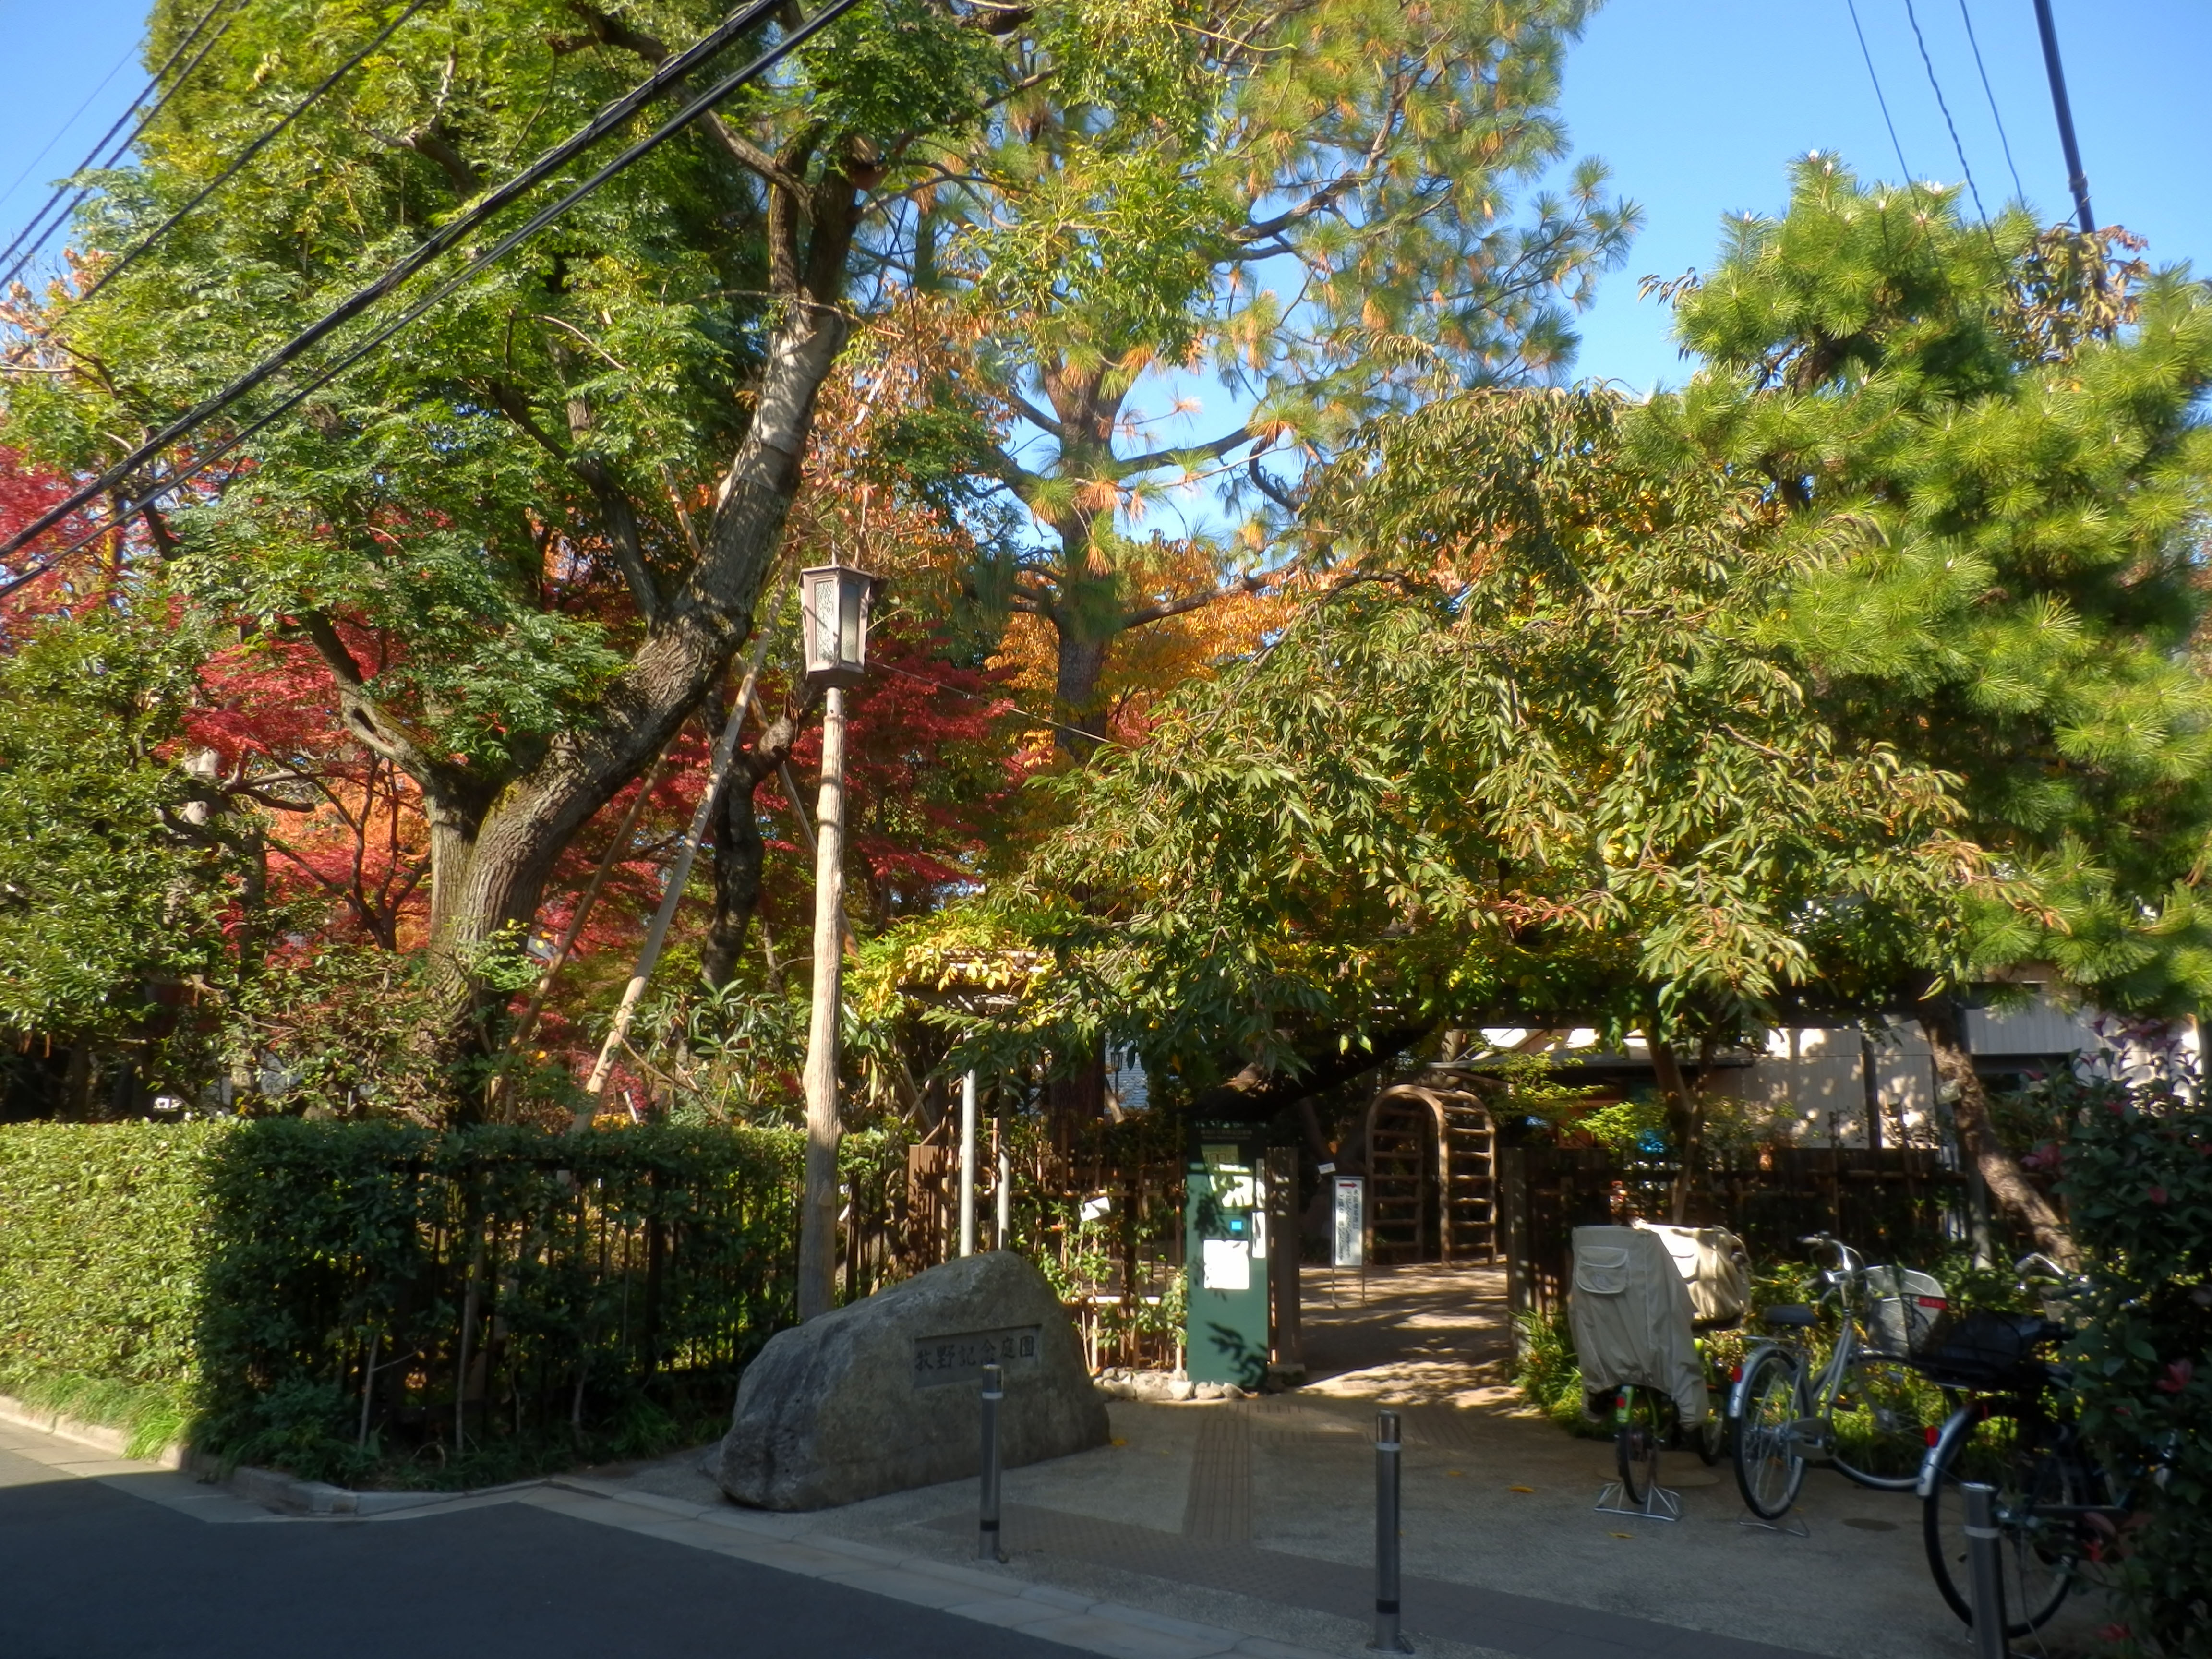 File:Makino Memorial Garden entrance 2013-11-24.JPG - Wikimedia Commons